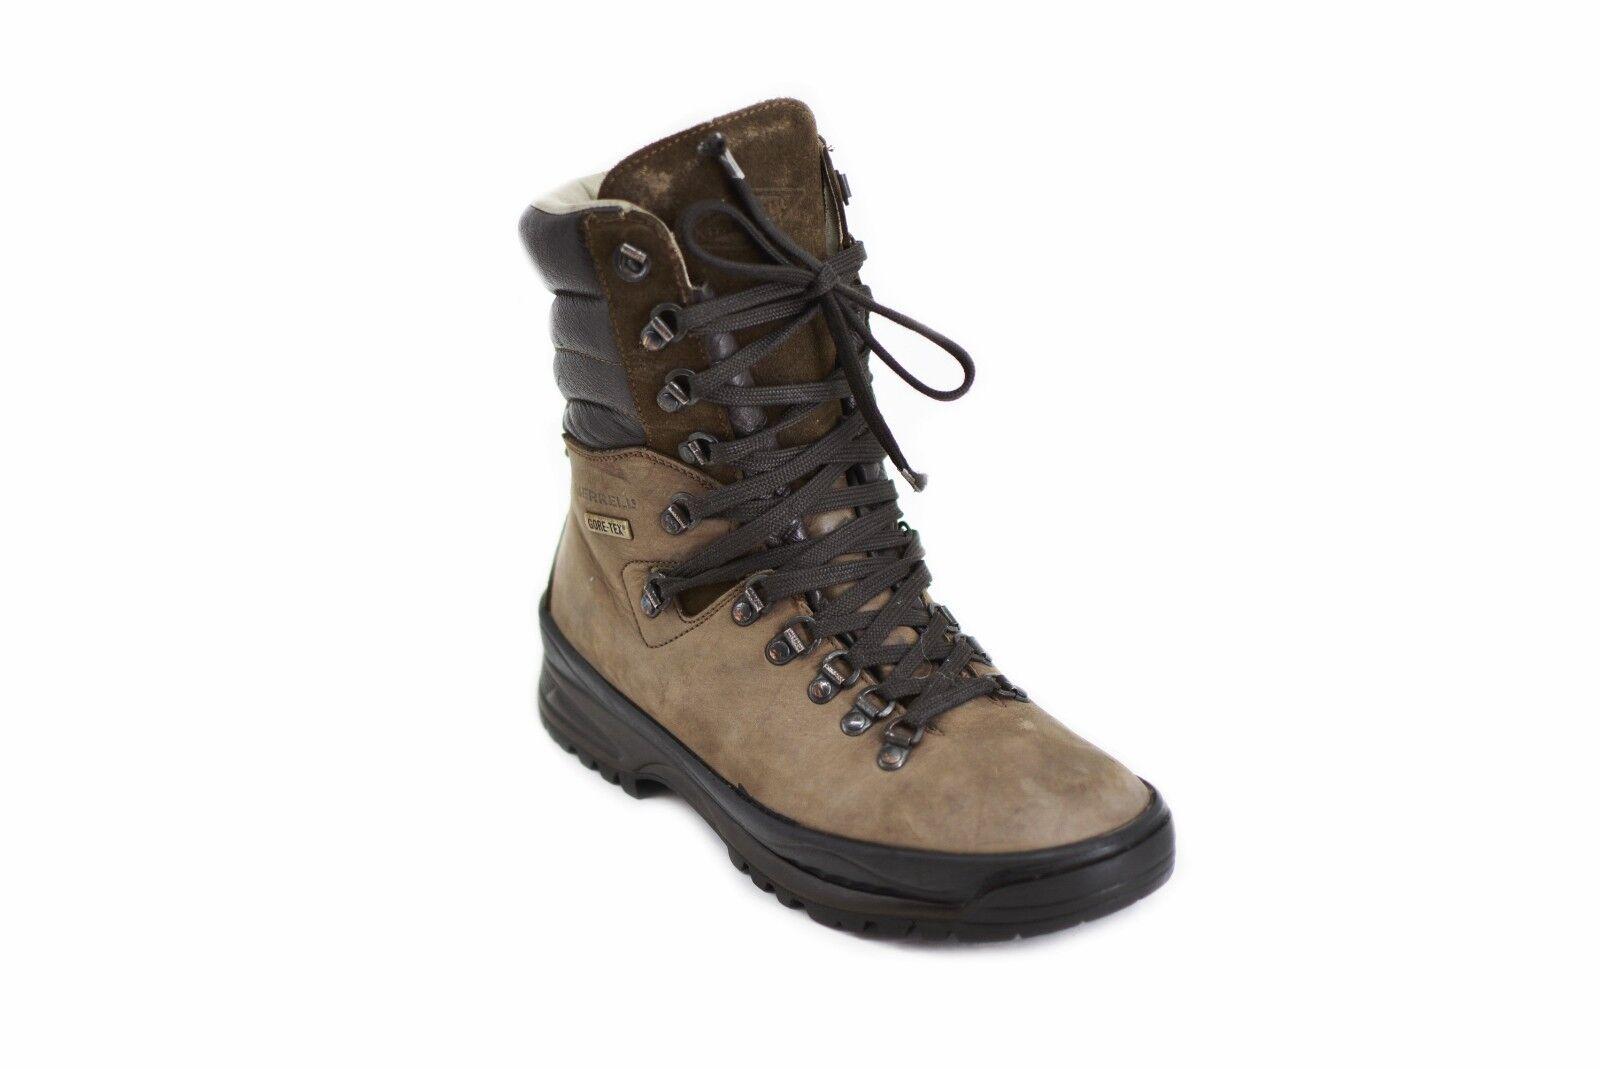 Merrell Mujer Para Caminar botas Gore Tex Talla 40 Mounty Trek Original